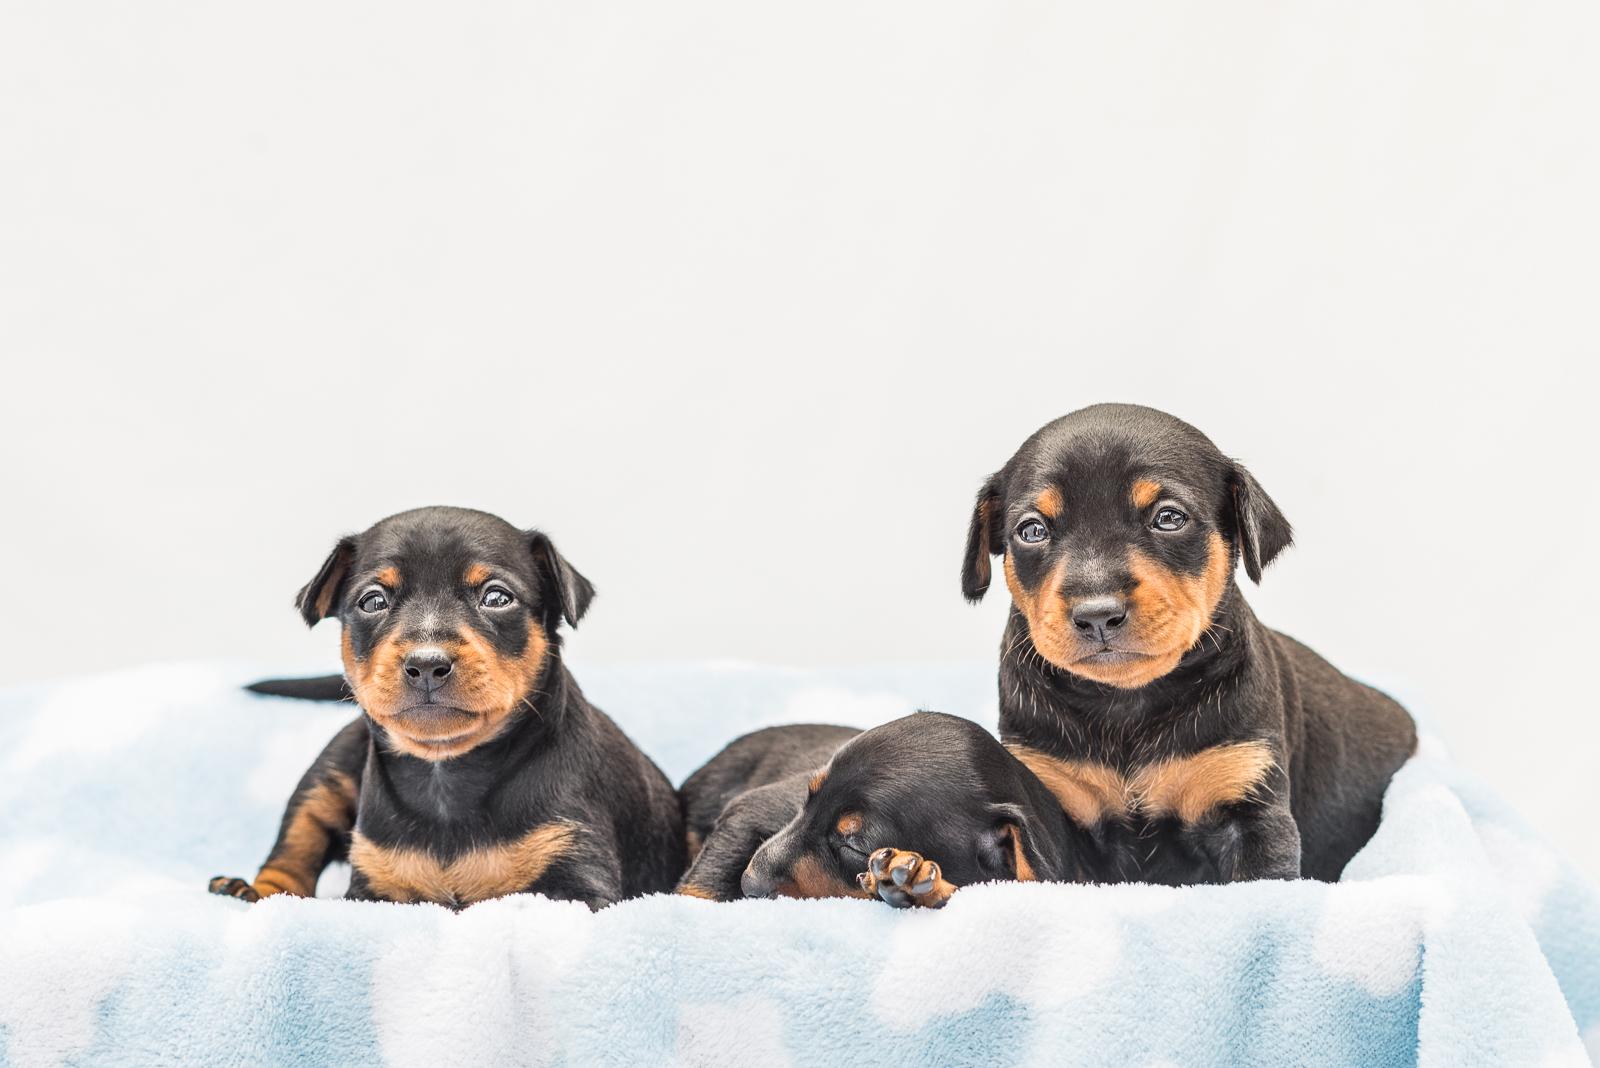 Puppies-11.jpg